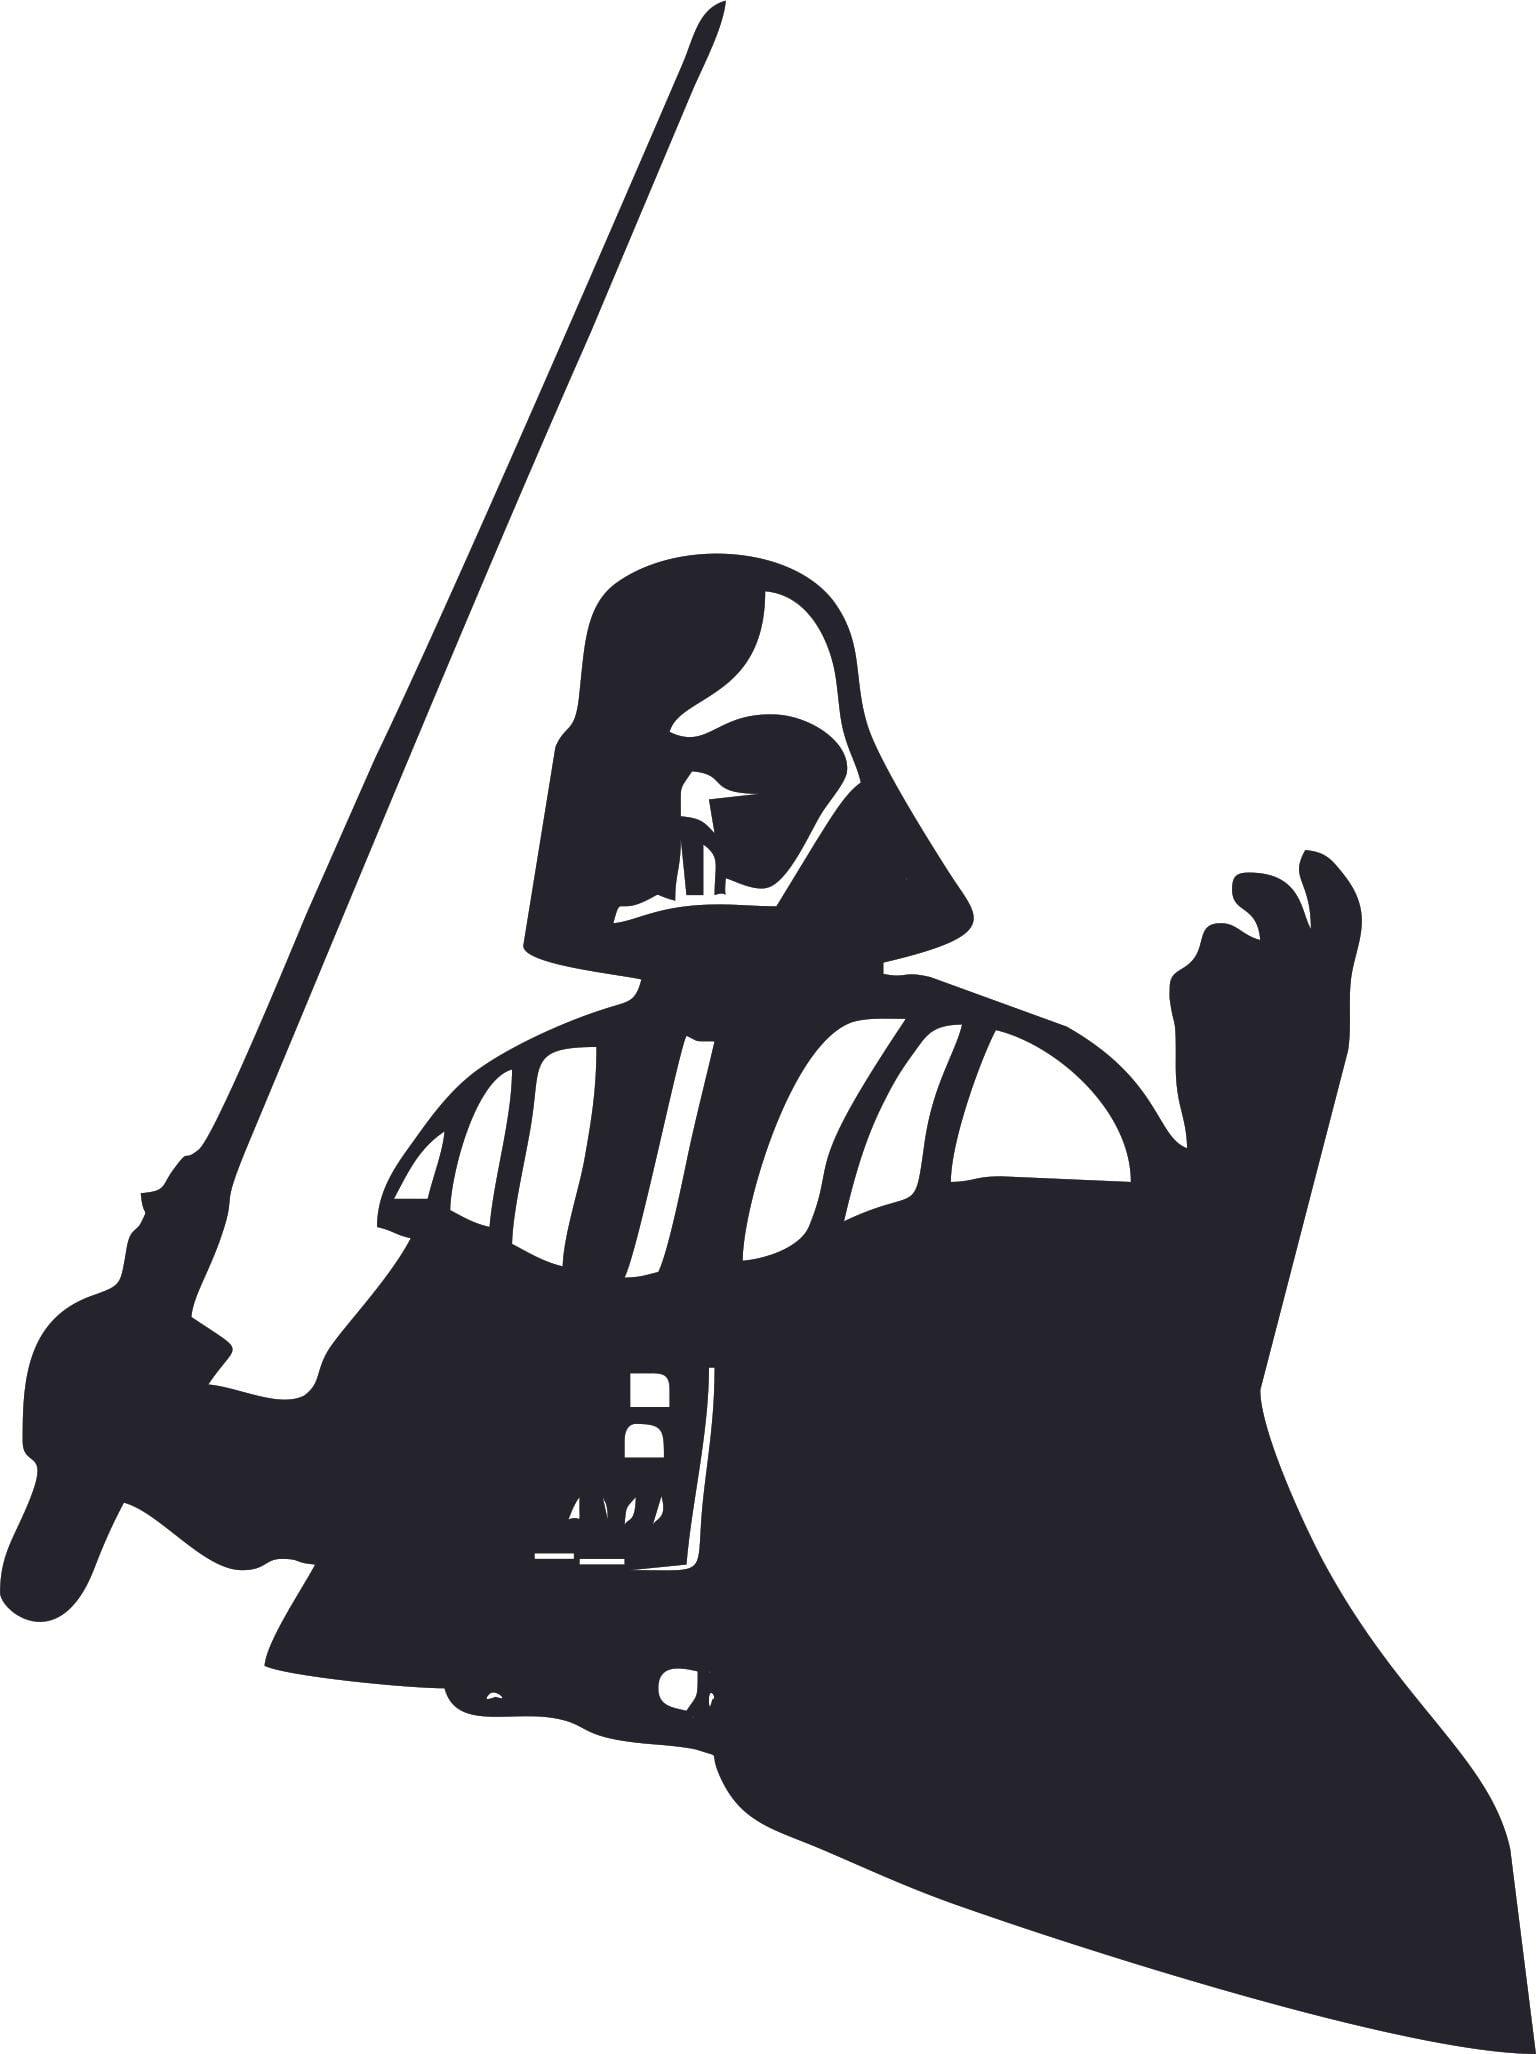 Bedroom 10x10 Size: Darth Vader Star Wars Cartoon Character Wall Art Vinyl